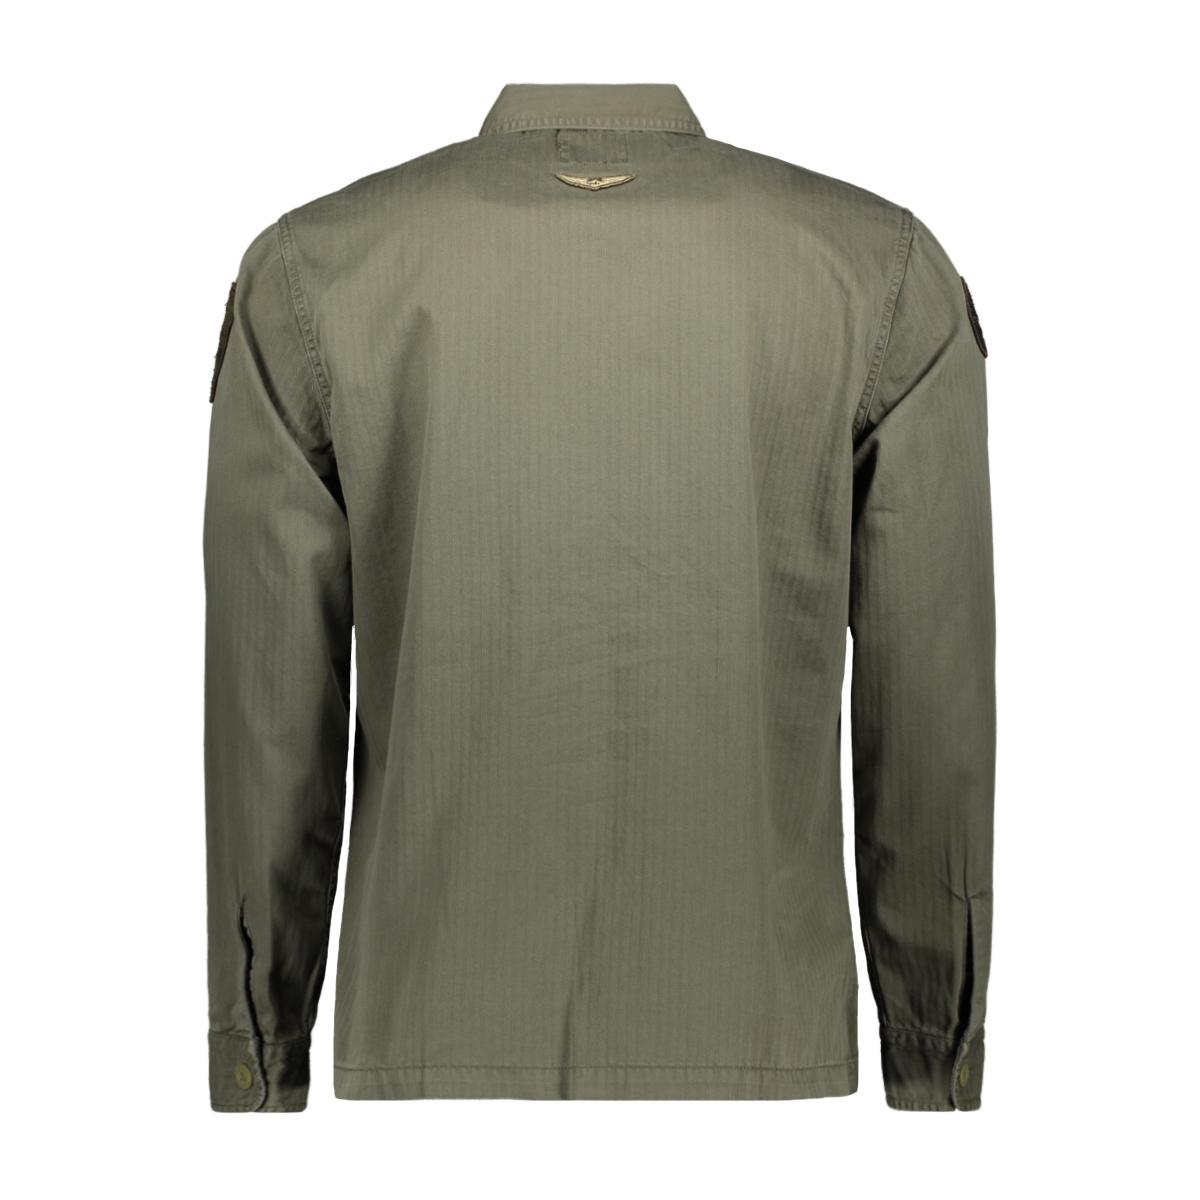 long sleeve shirt psi196235 pme legend overhemd 6414